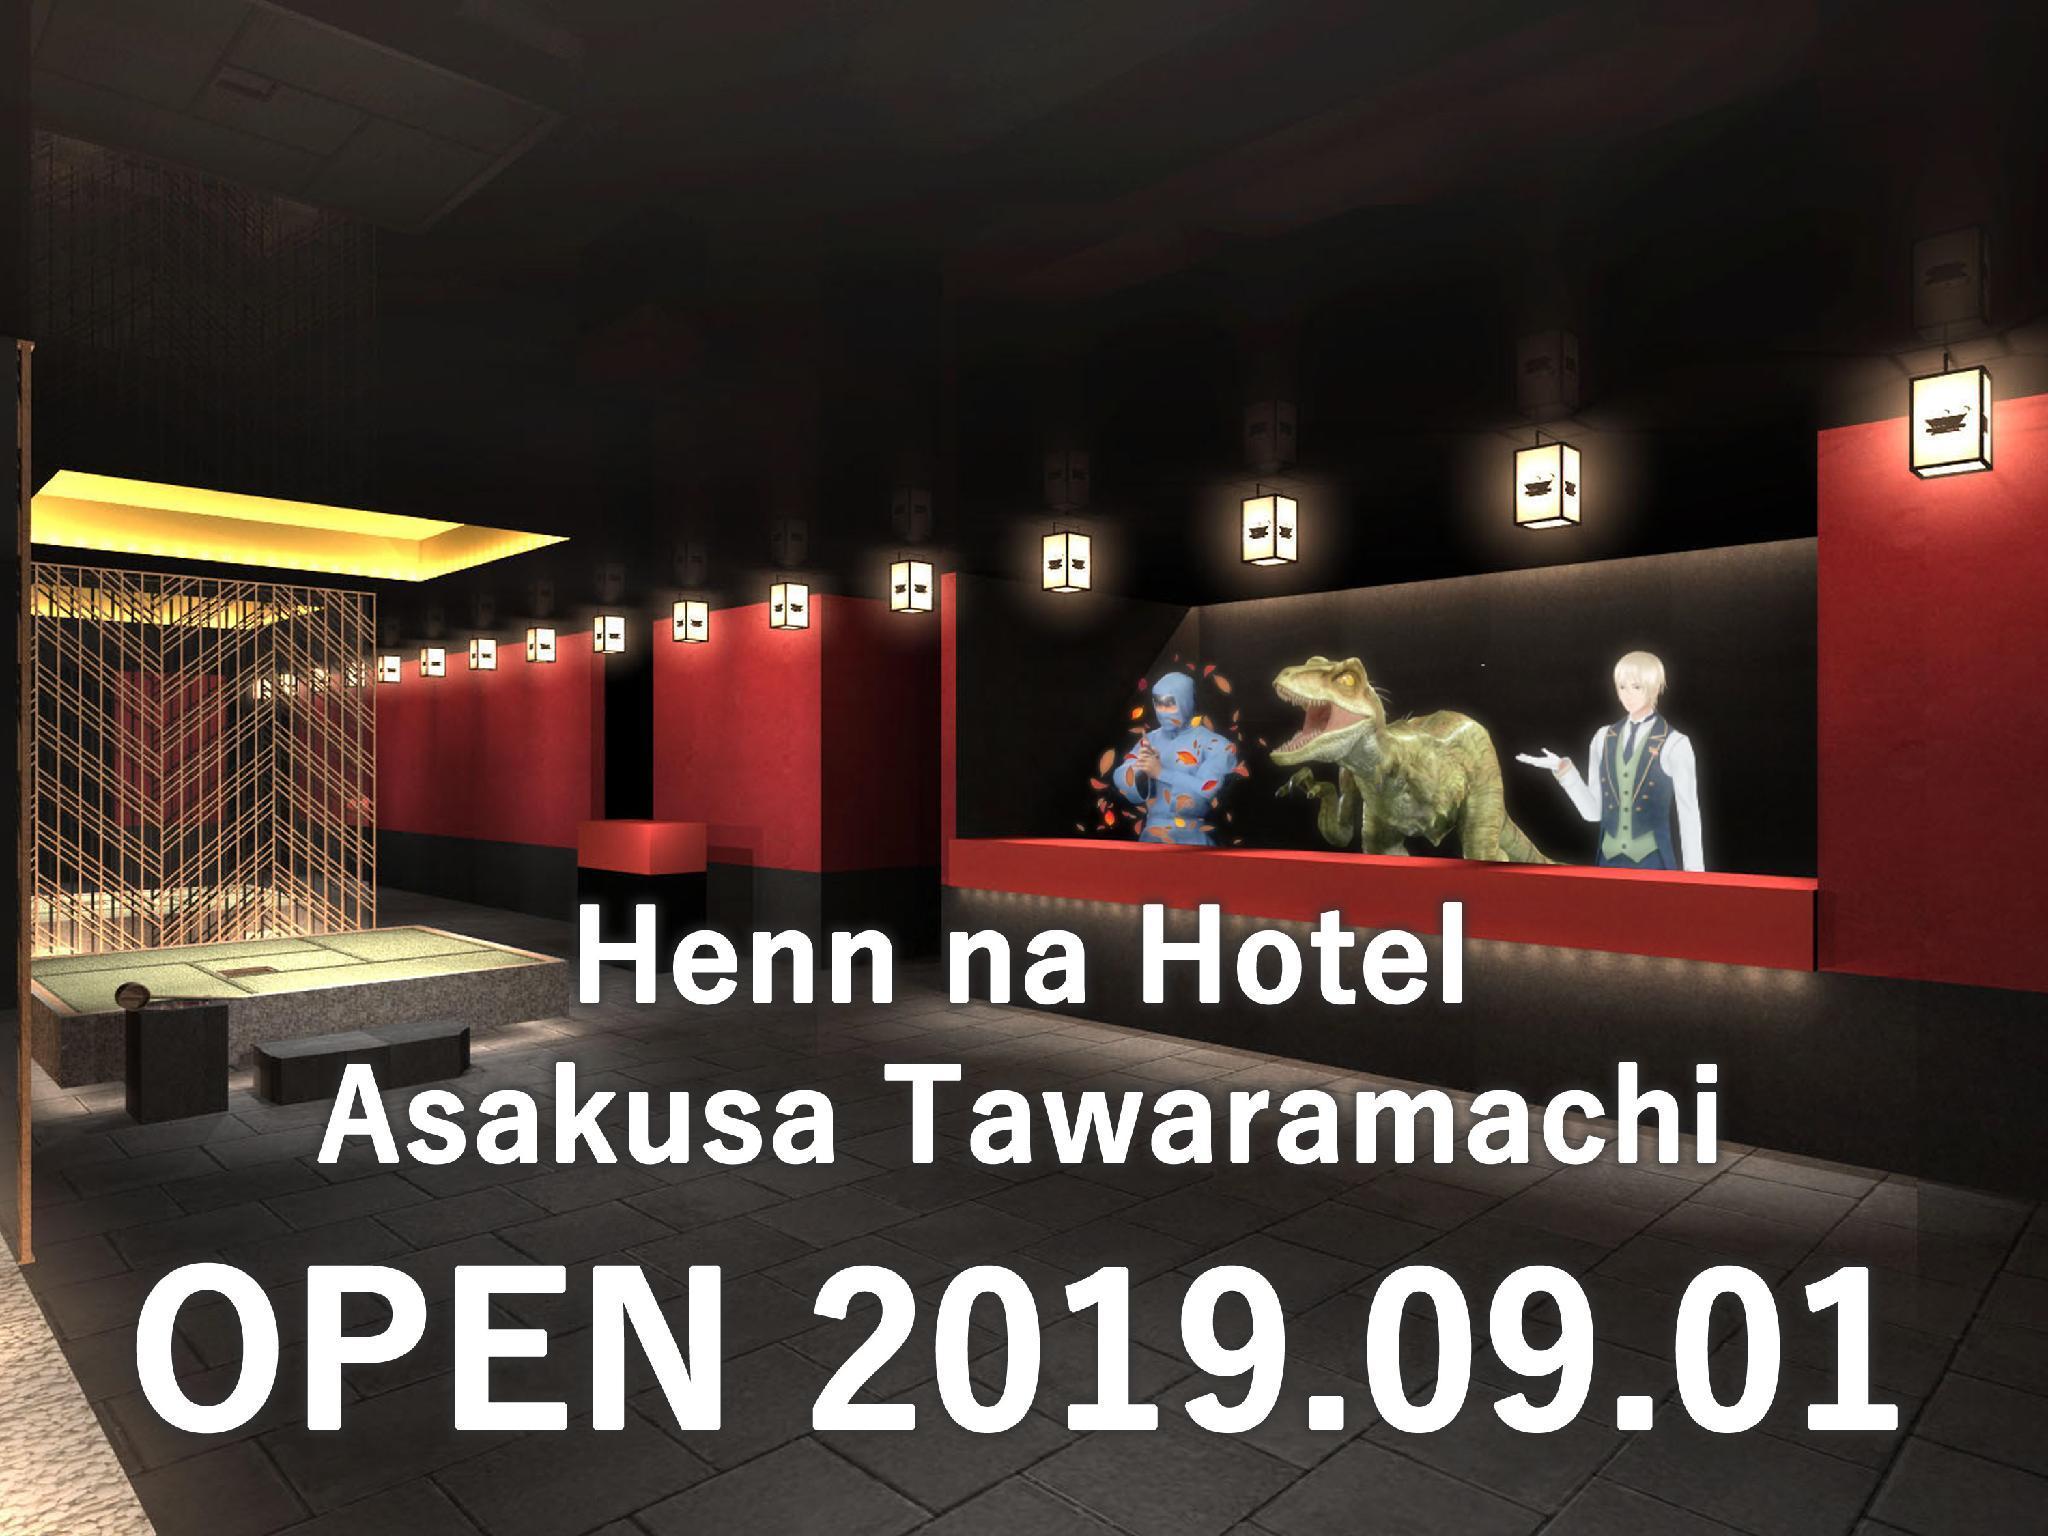 Henn Na Hotel Tokyo Asakusa Tawaramachi